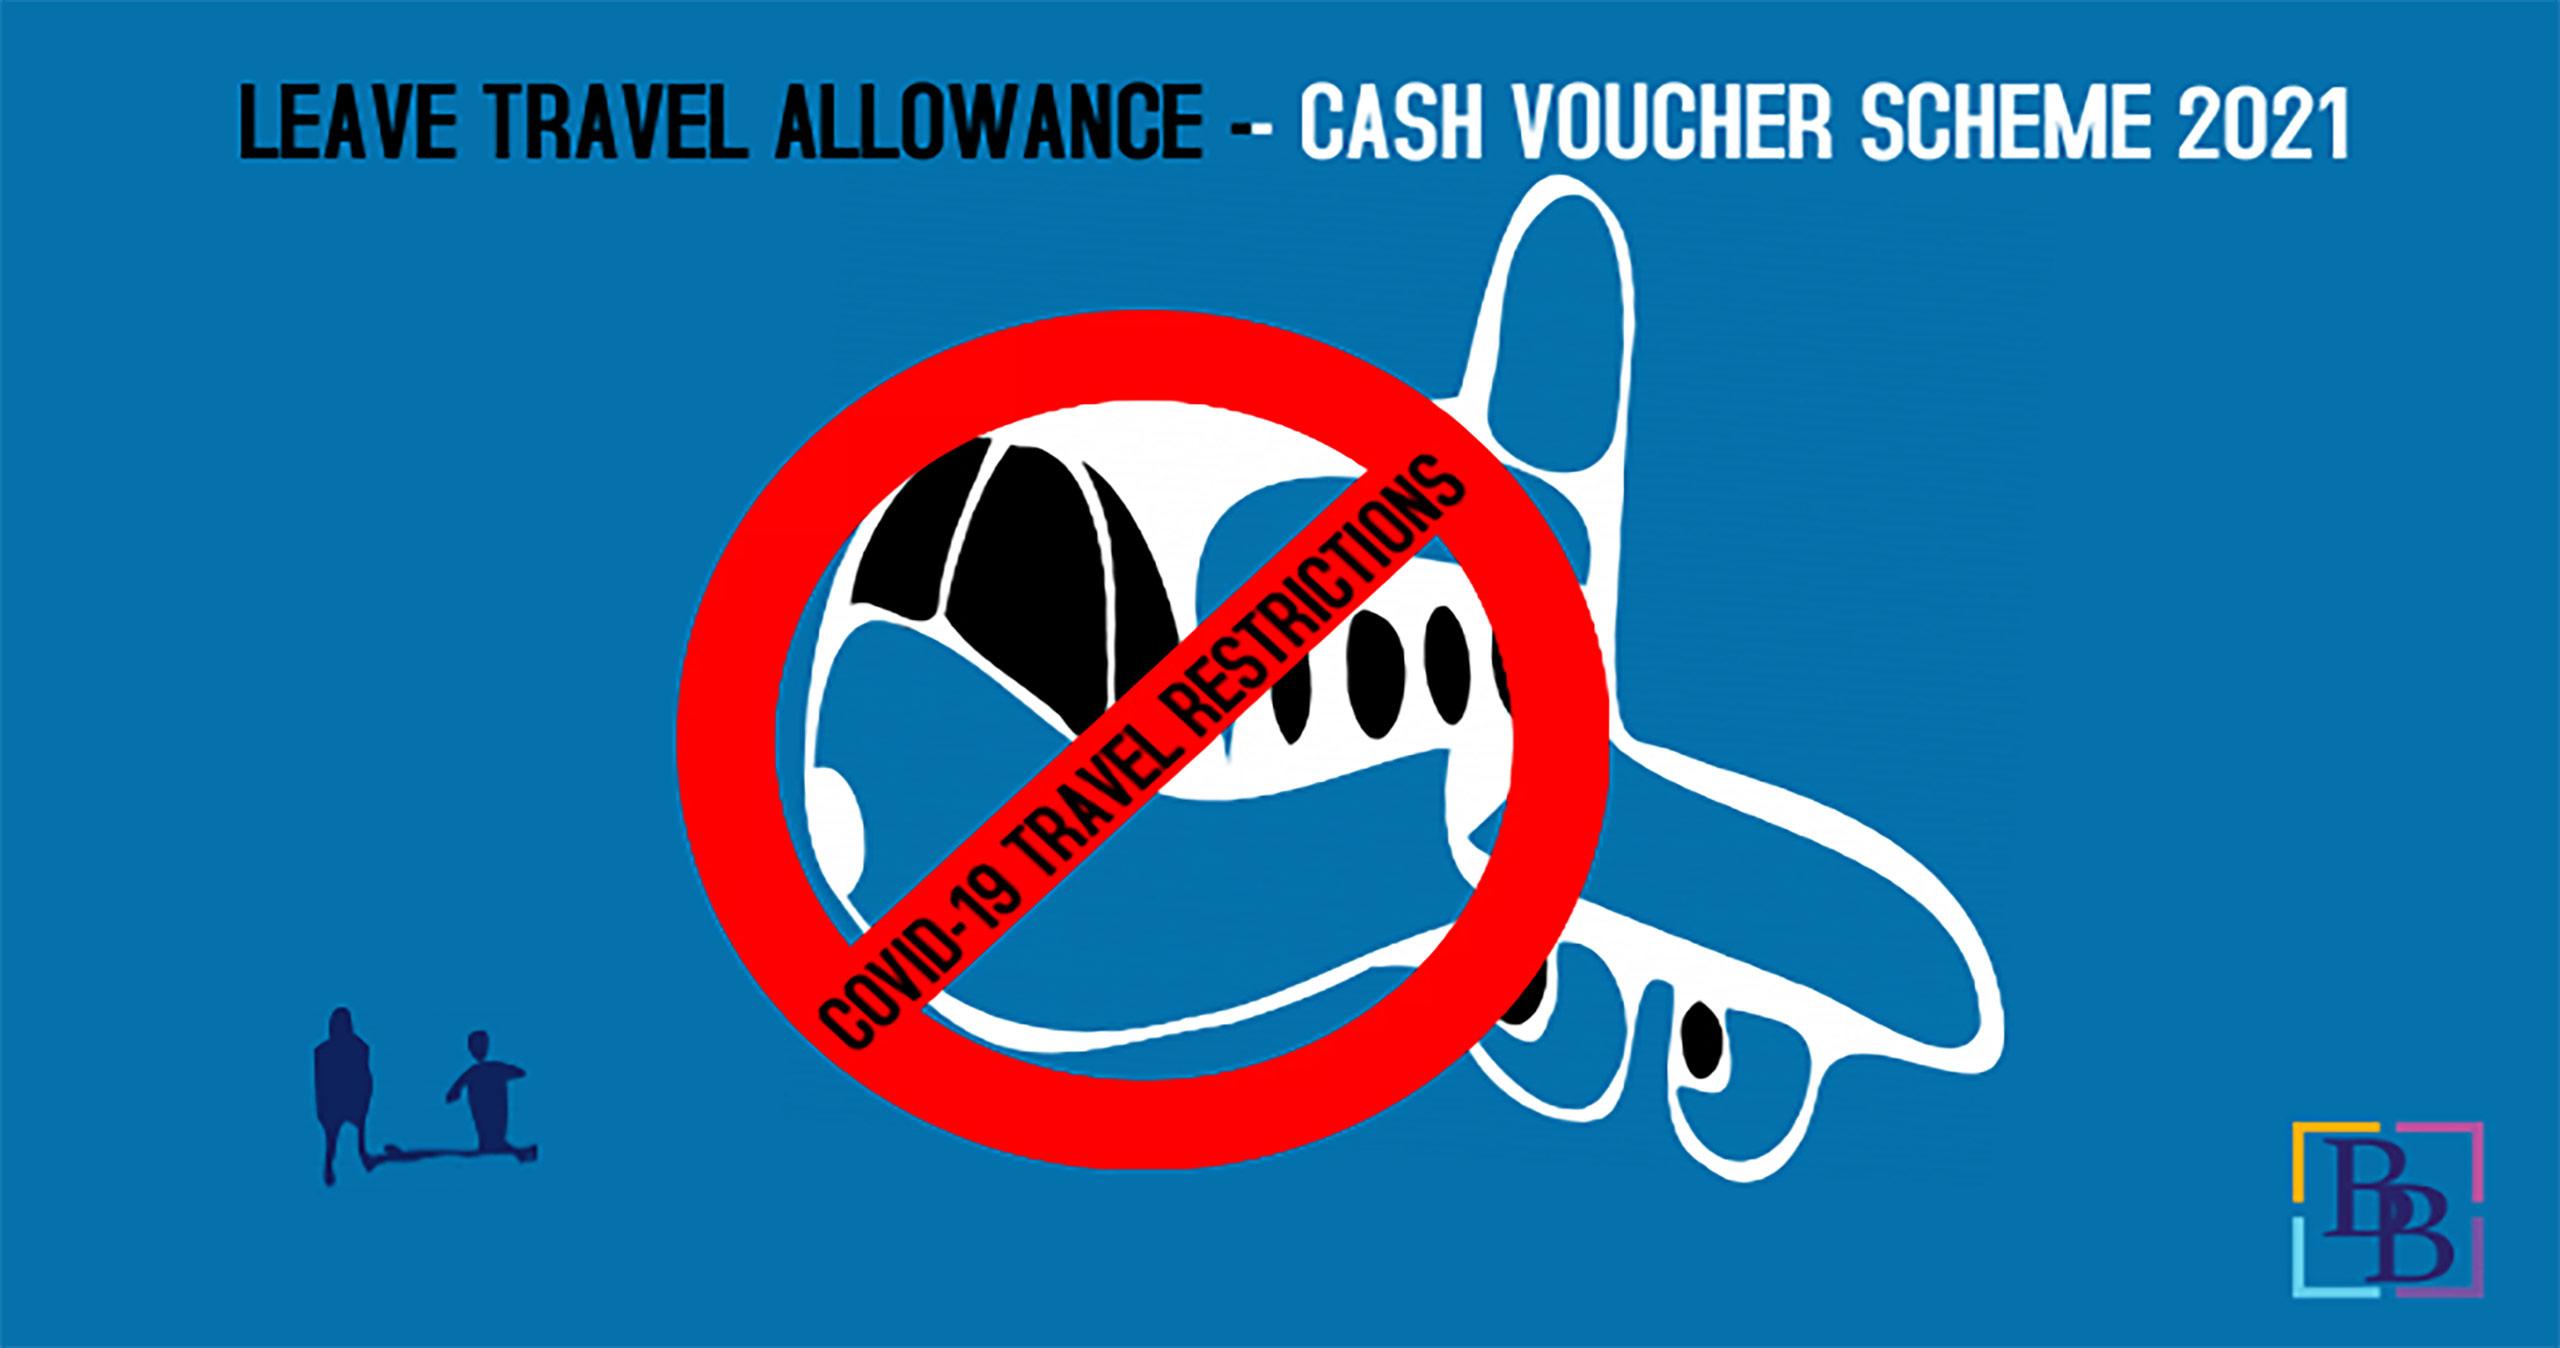 Leave travel allowance Cash voucher scheme